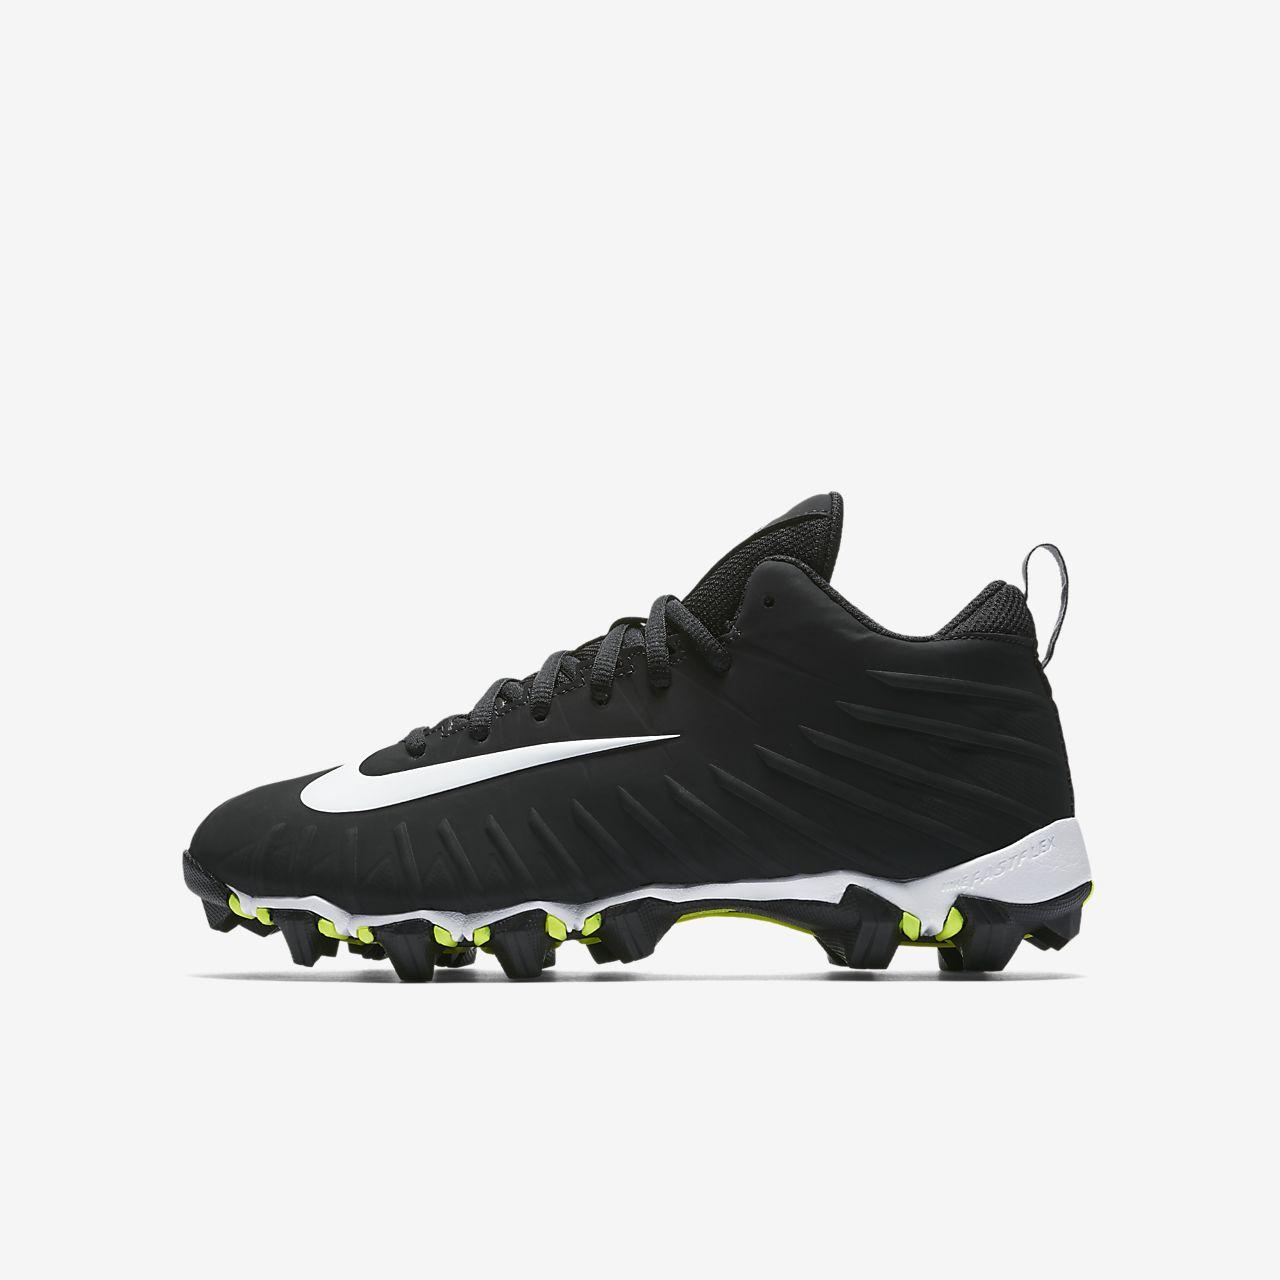 ... Nike Alpha Menace Shark (Wide) Little/Big Kids' Football Cleat